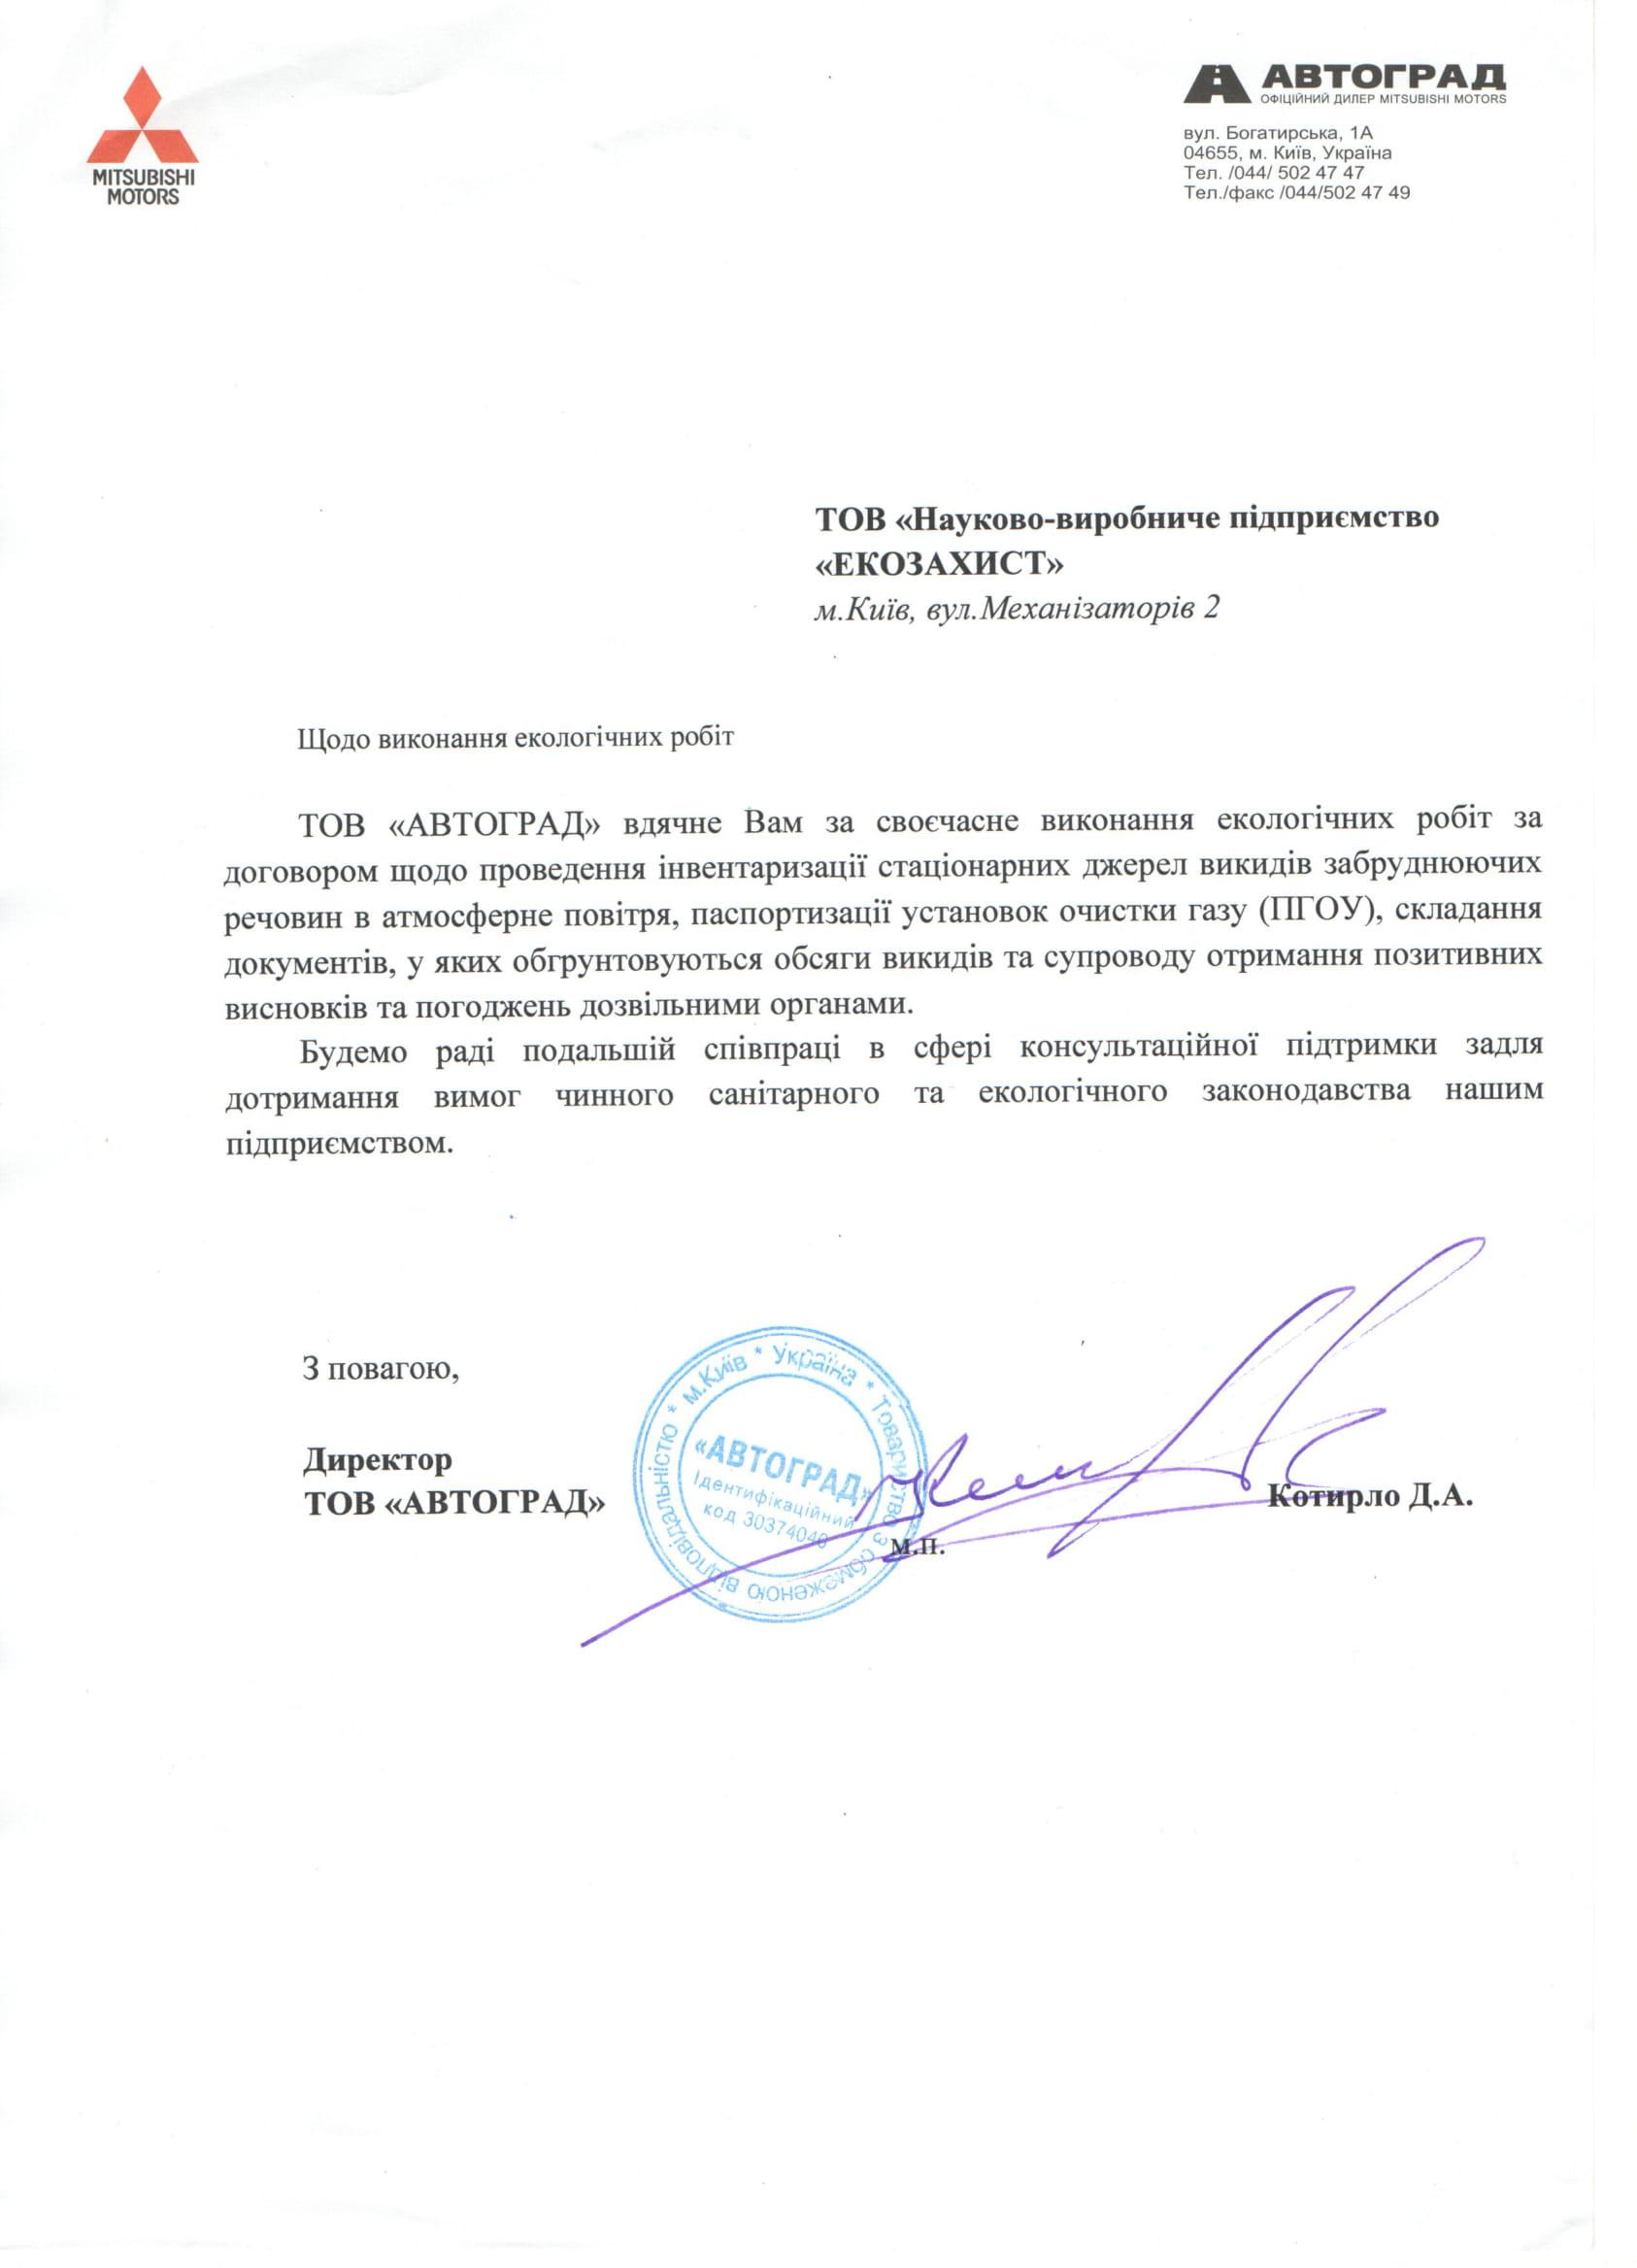 "Директор ТОВ ""Автоград"" – Котирло Д.А."